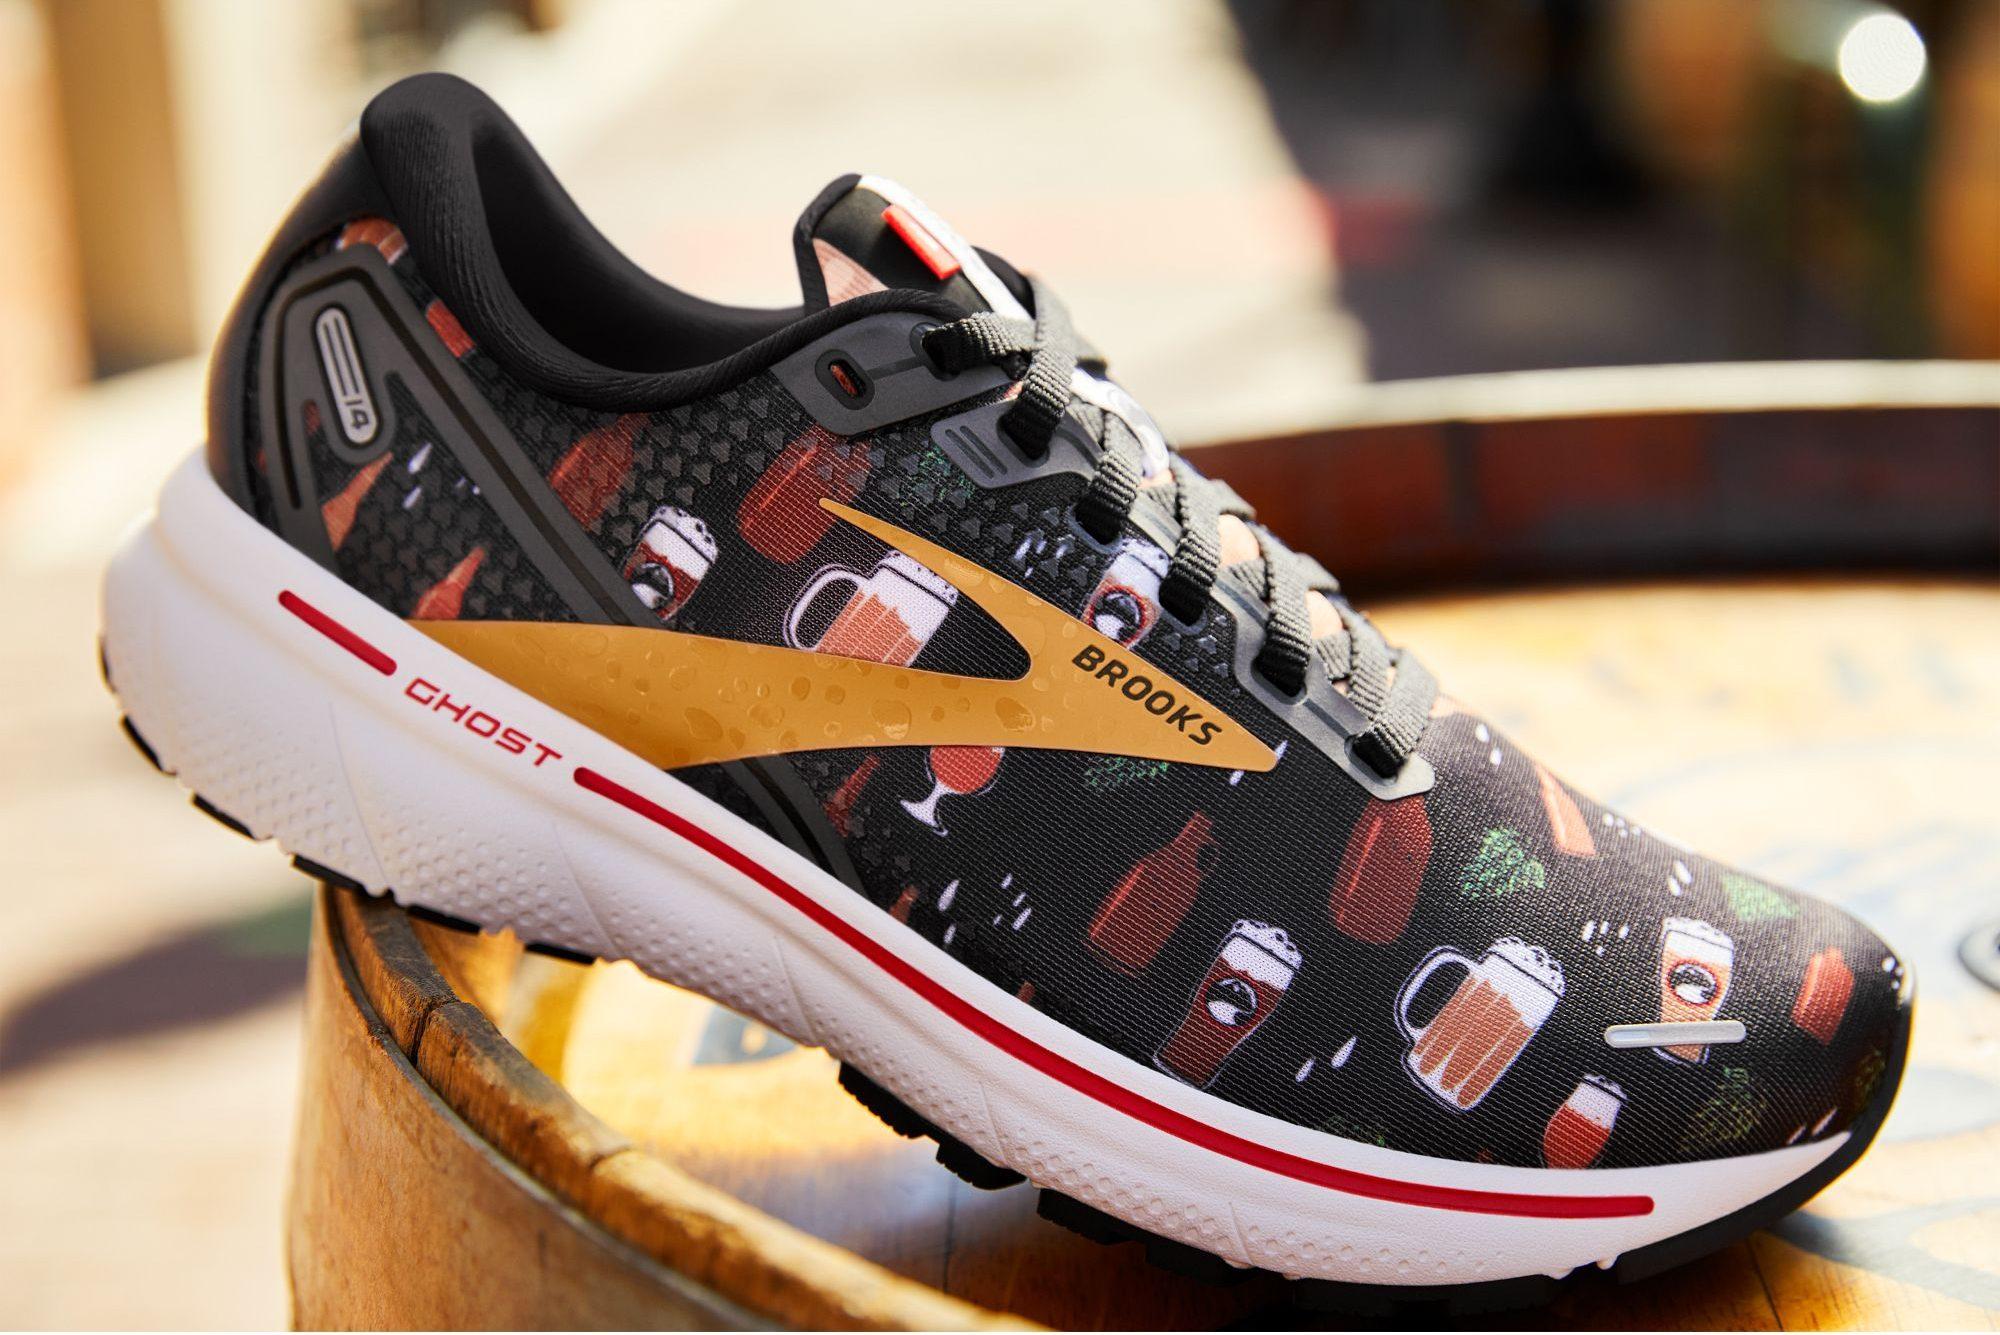 Deschutes Brewery and Brooks Running Deschutes themed Run Hoppy Ghost 14 Road Running Shoes. (image courtesy of Brooks Running)